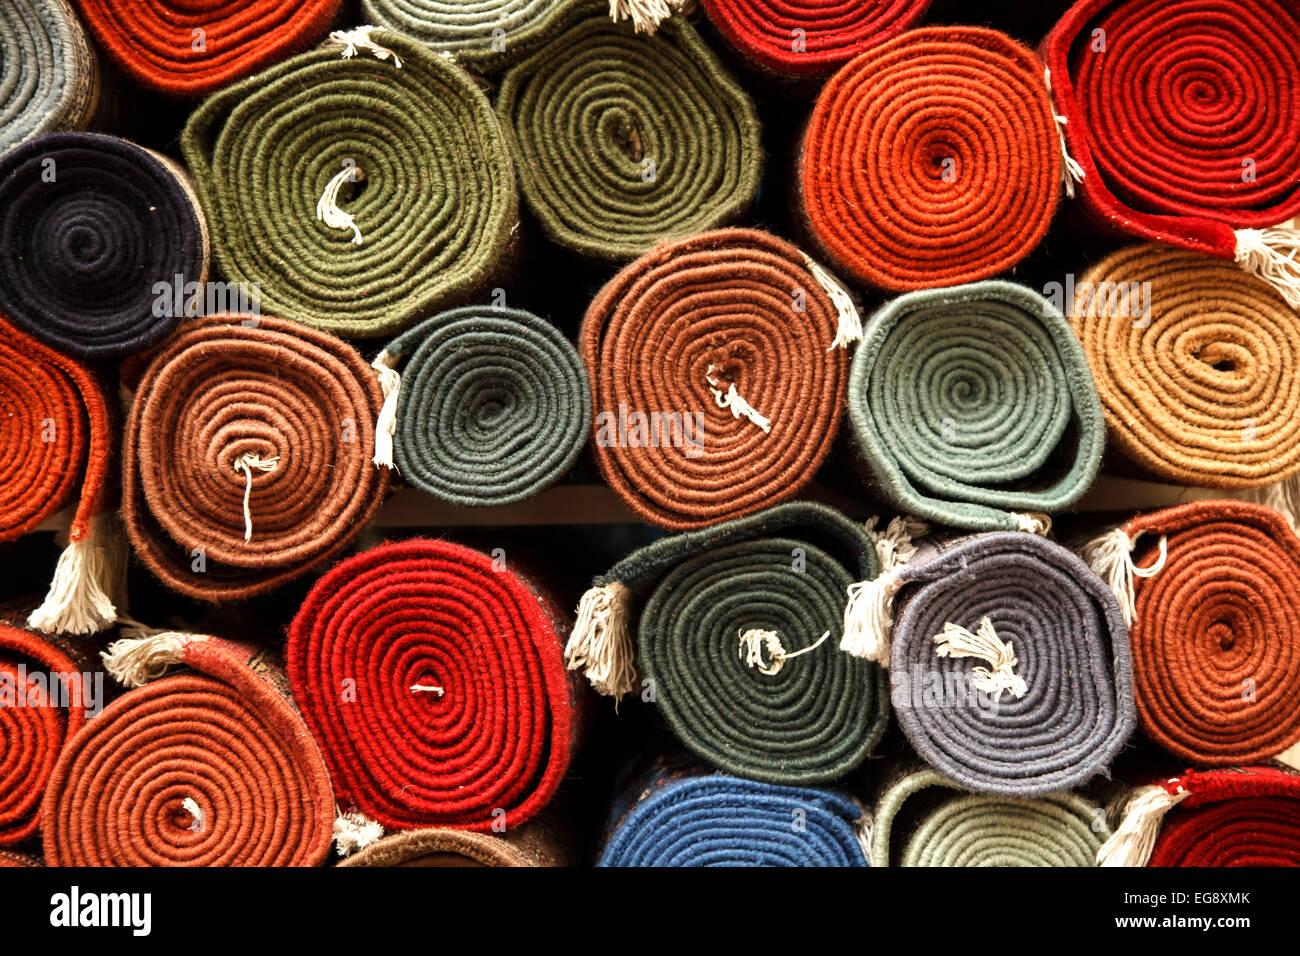 Rulli per tappeti, Jaipur, Rajasthan, India Immagini Stock